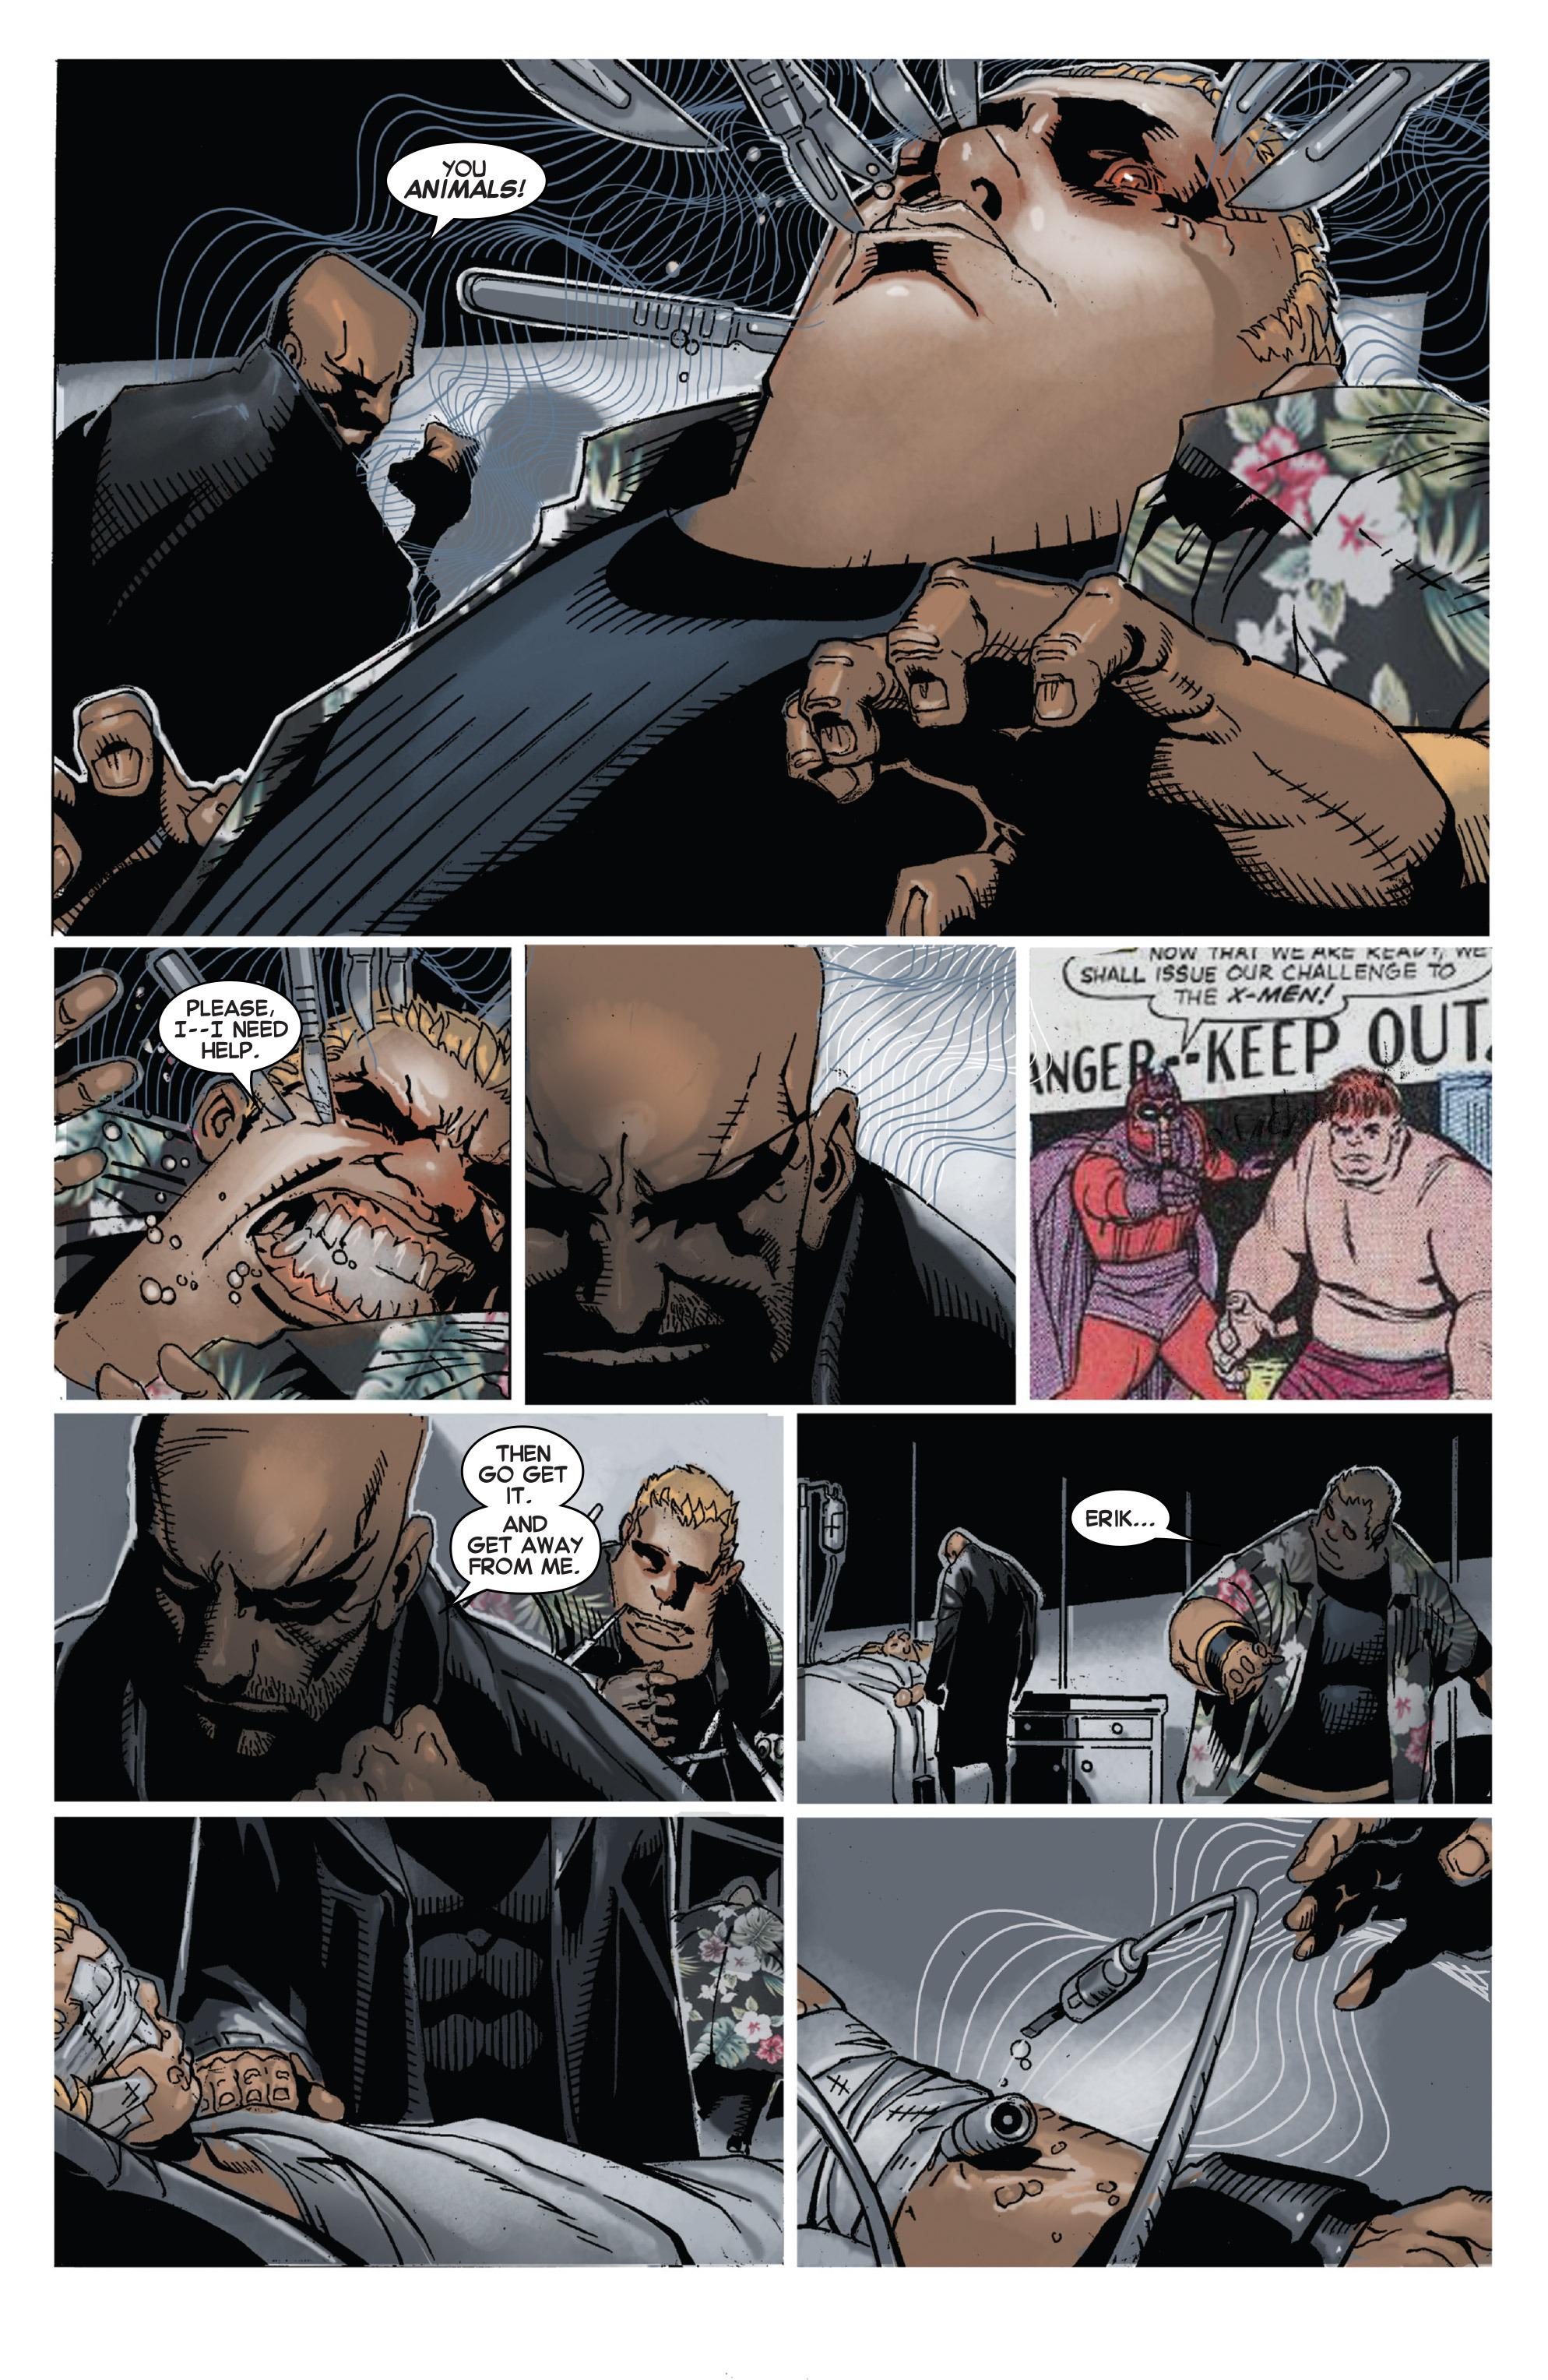 Read online Uncanny X-Men (2013) comic -  Issue # _TPB 4 - vs. S.H.I.E.L.D - 52